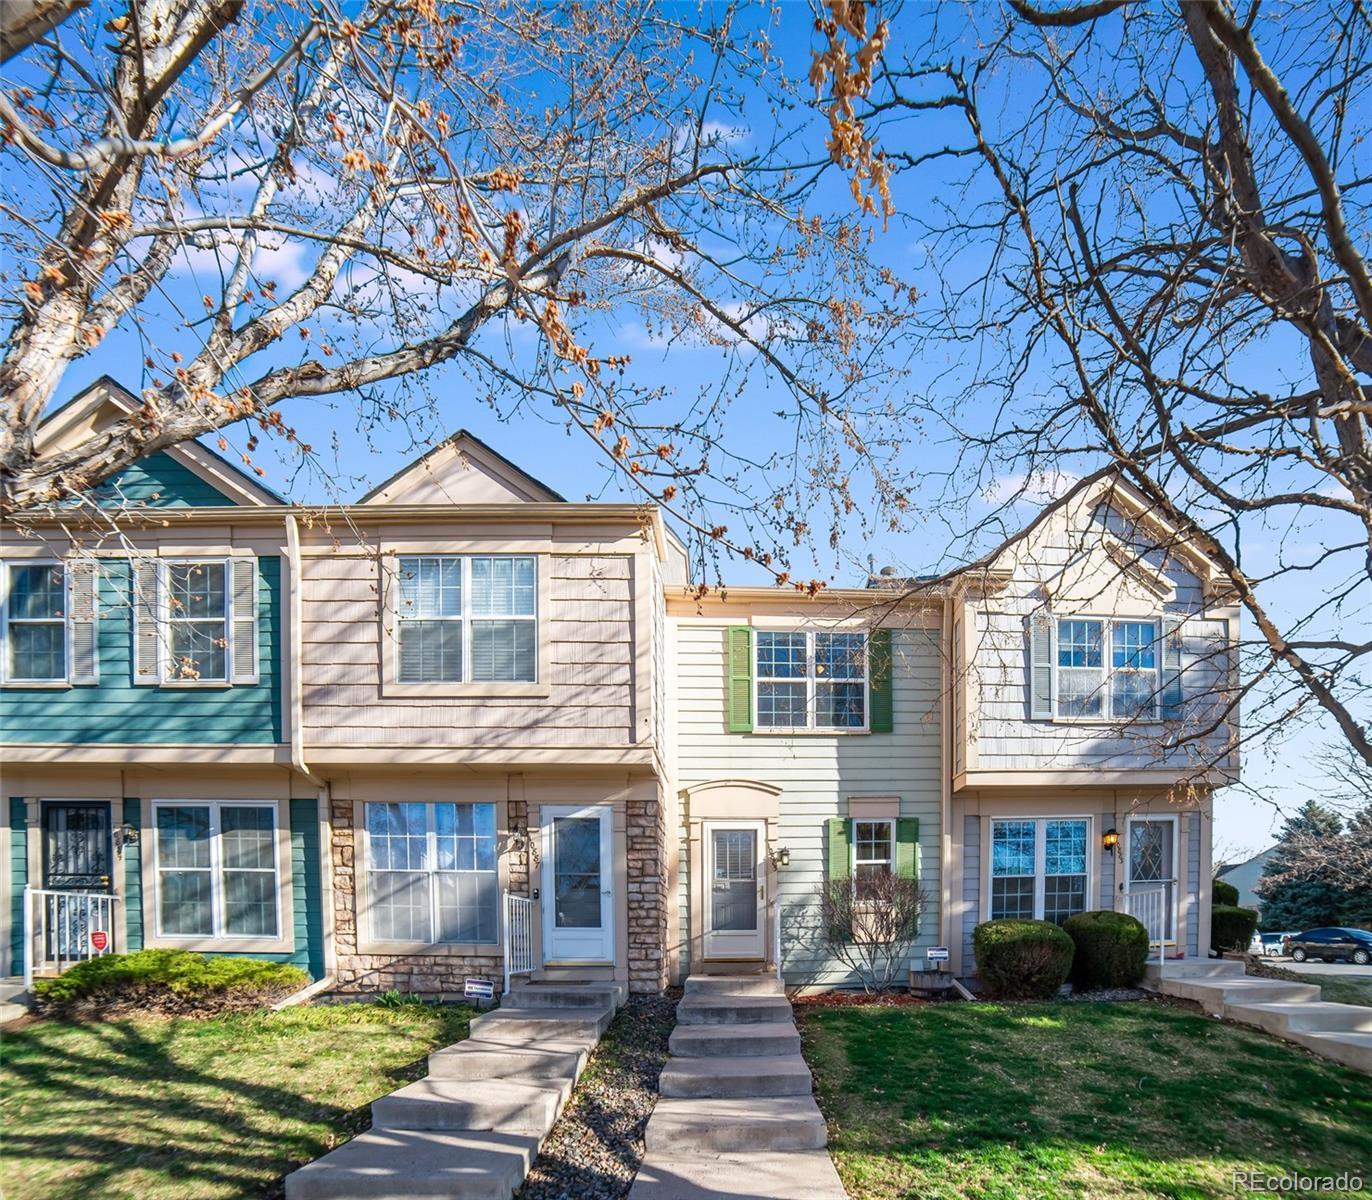 MLS# 5669363 - 2 - 10885 W Dartmouth Avenue, Lakewood, CO 80227